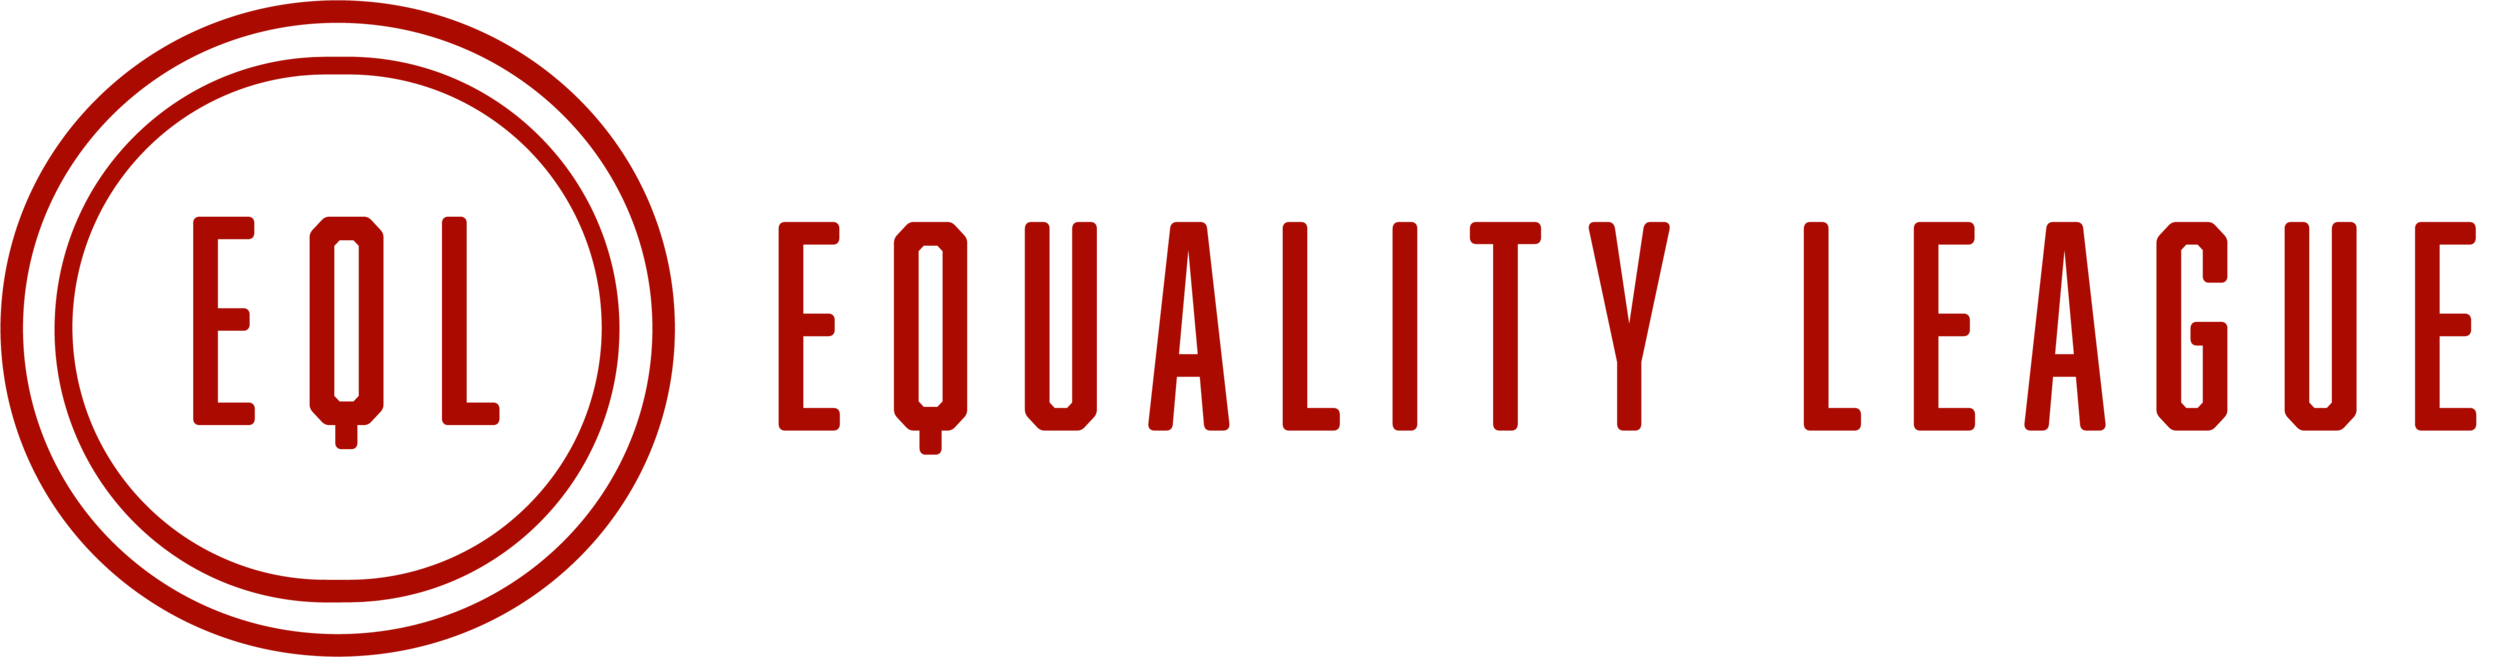 EQL Logo REDO WHITE BLACK BACKGROUND (2).png